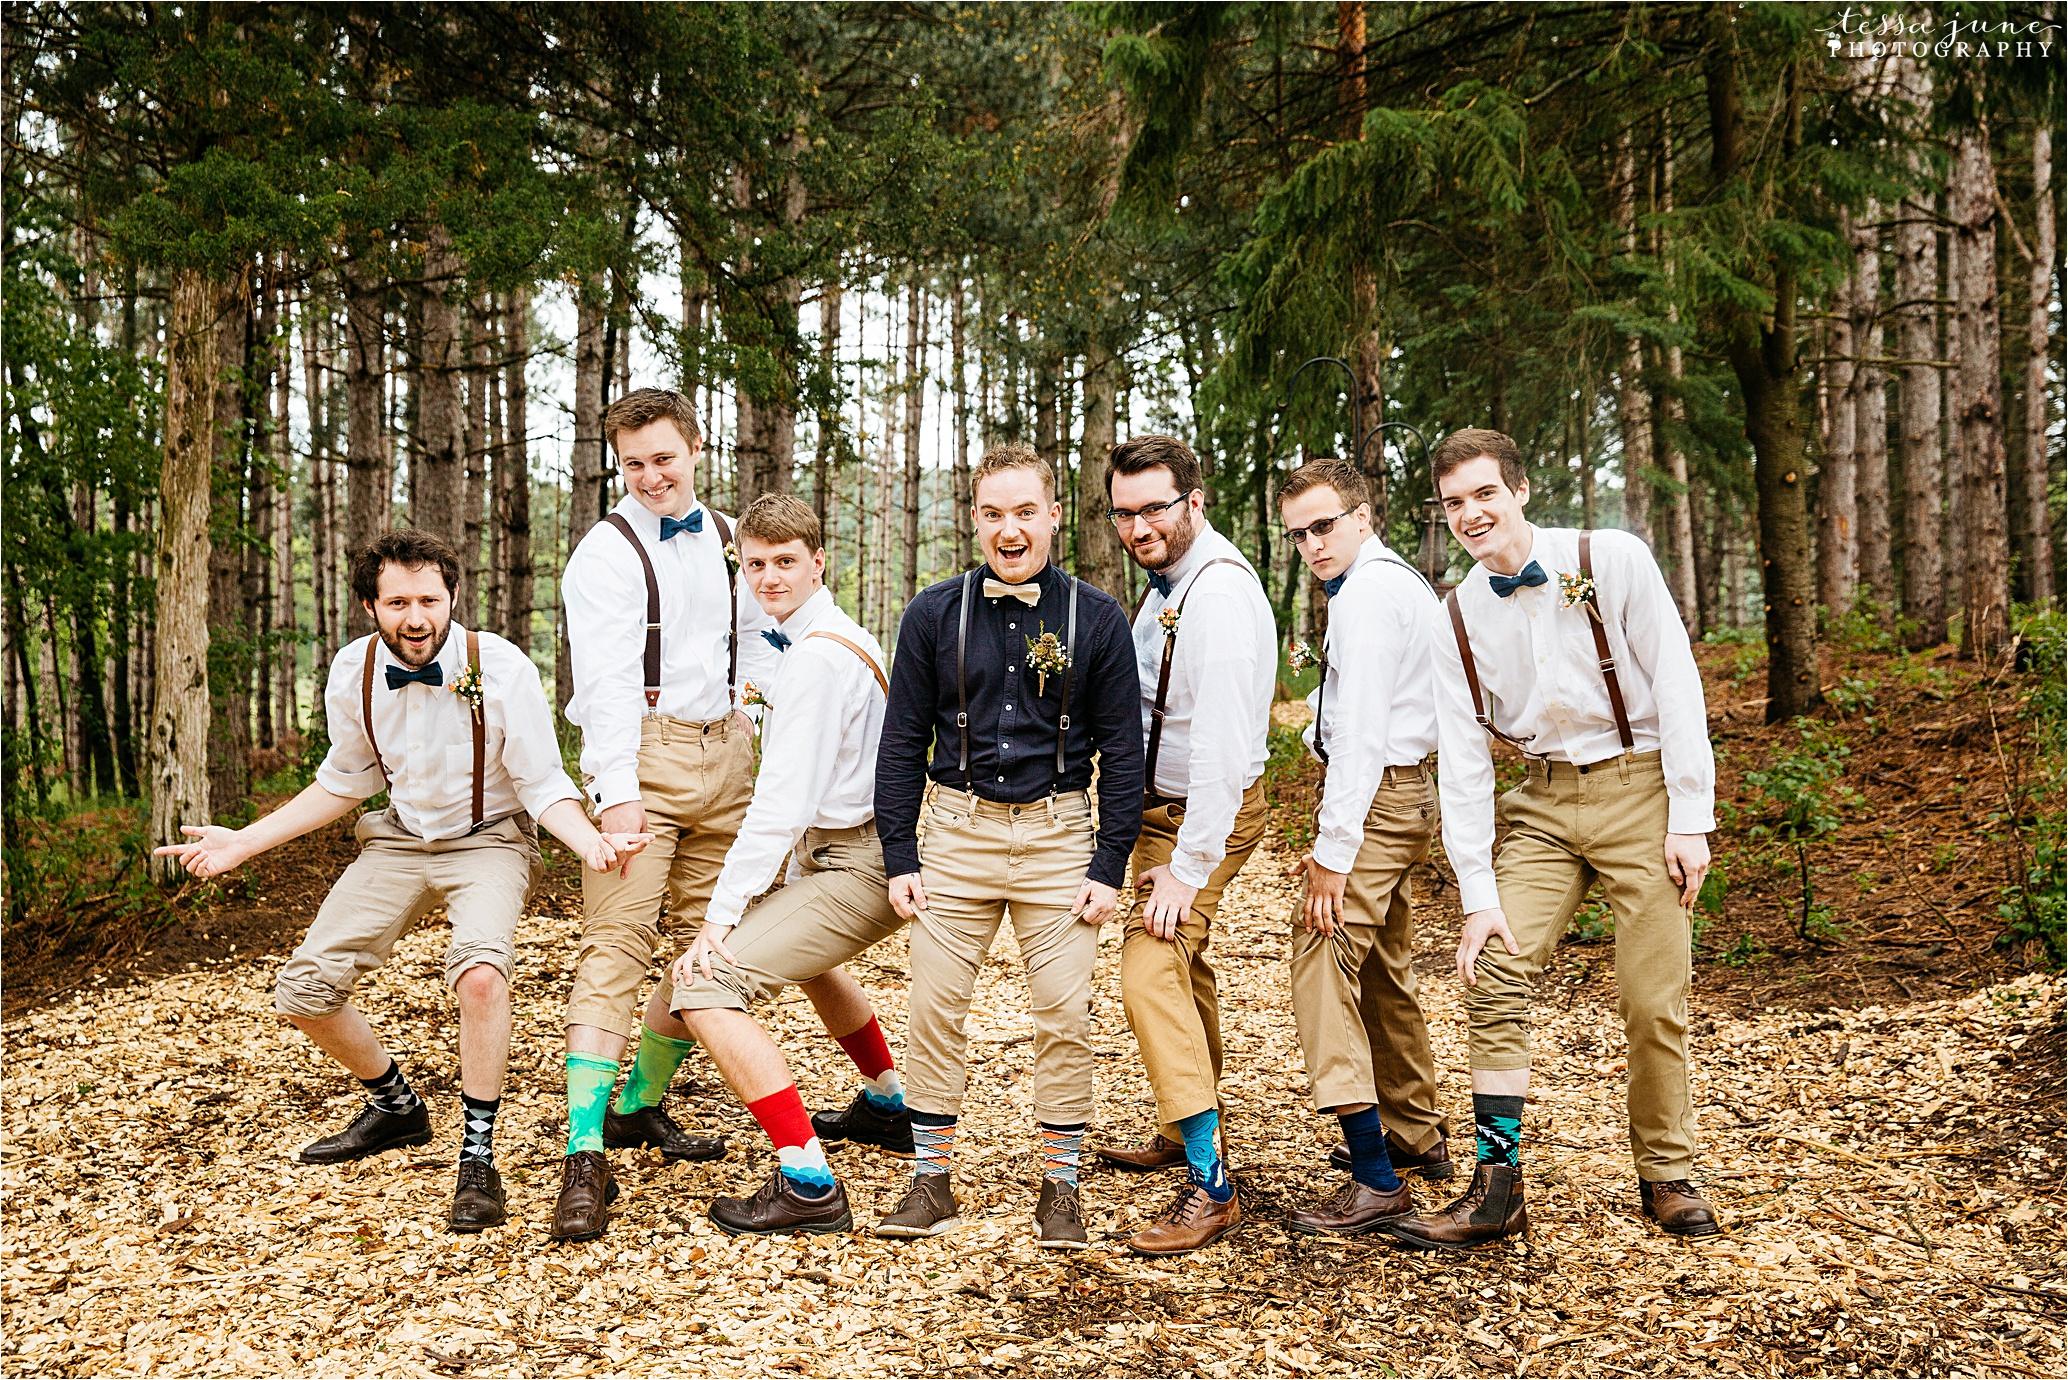 bohemian-forest-wedding-stillwater-minnesota-flower-crown-st-cloud-photographer-groomsmen-socks